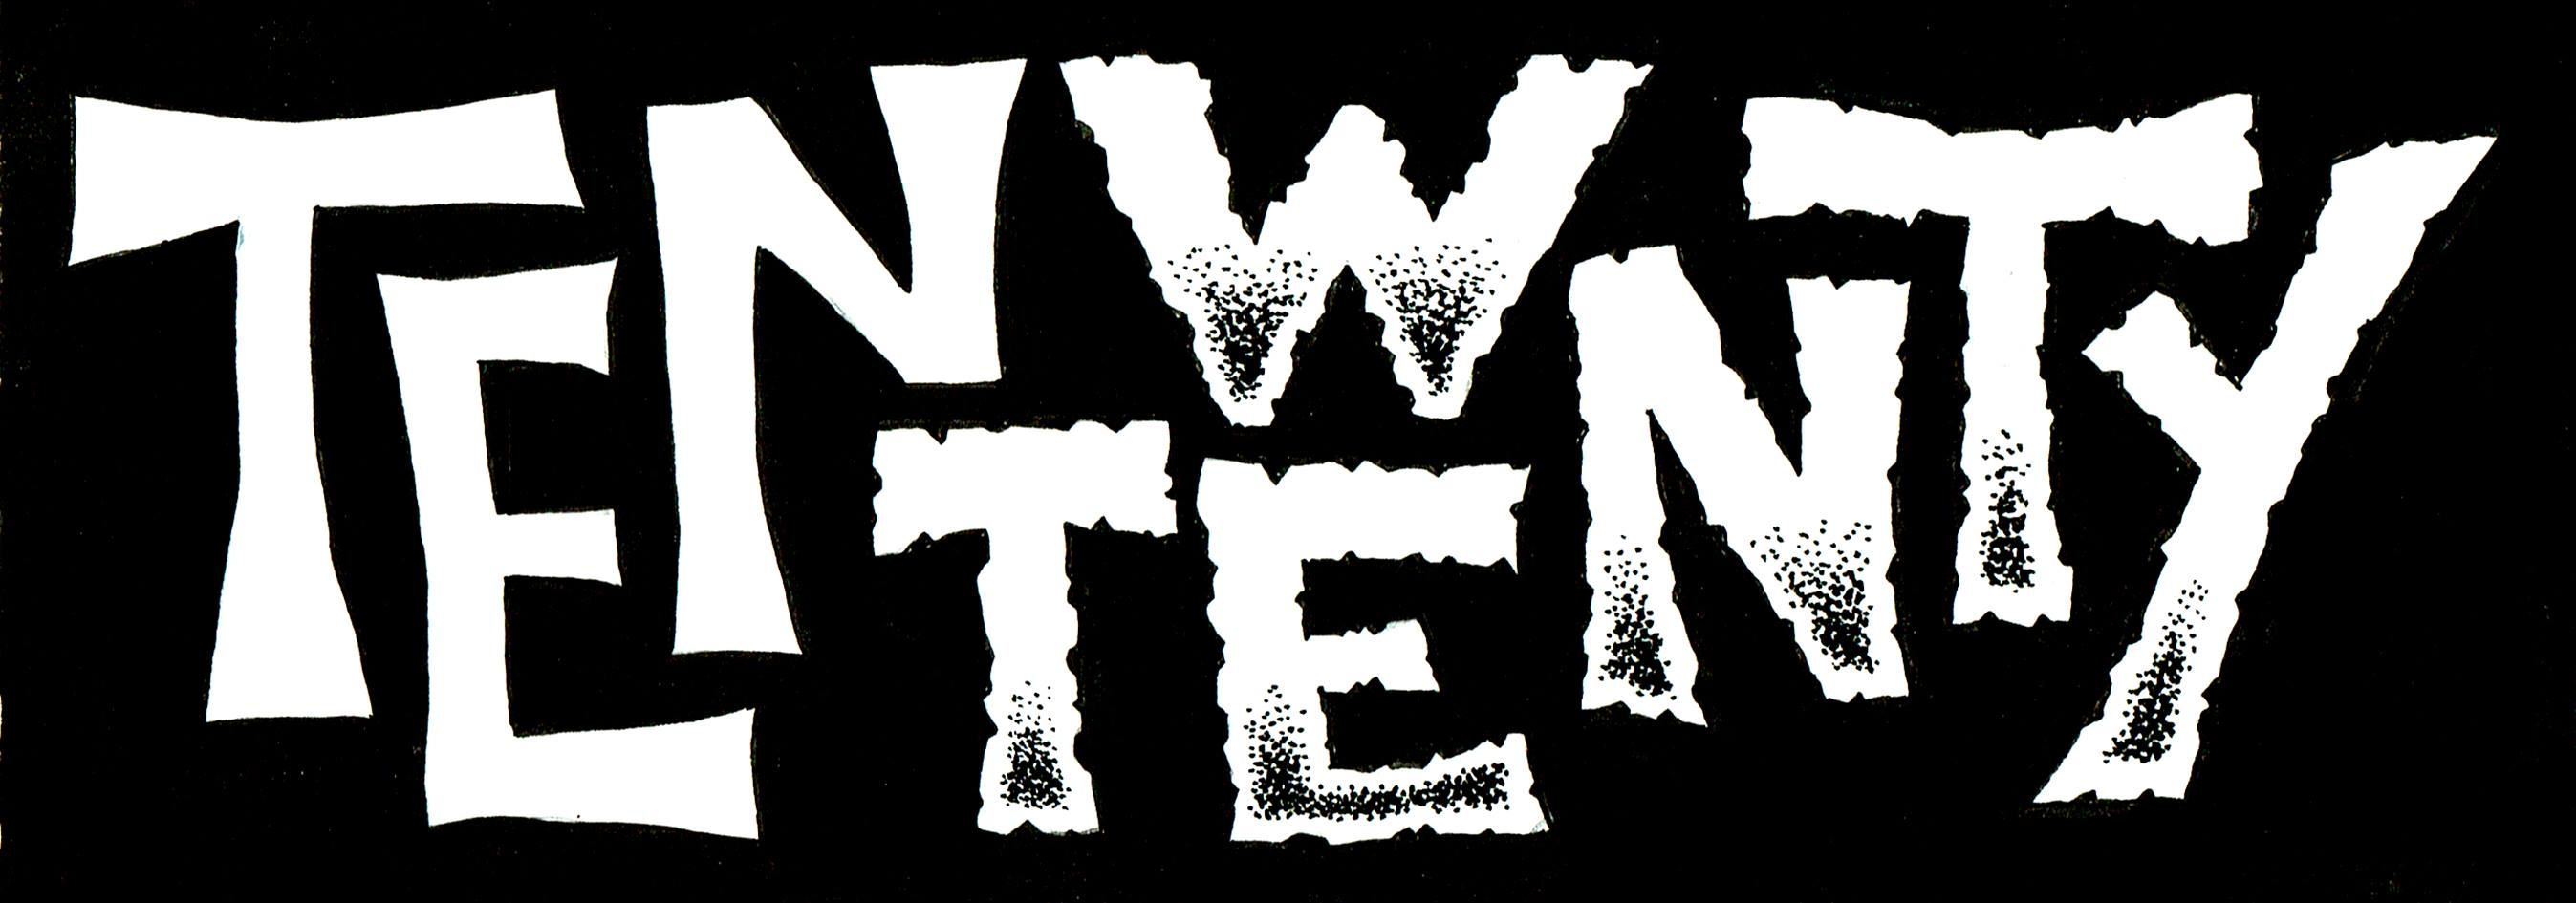 Ten Twenty Fest